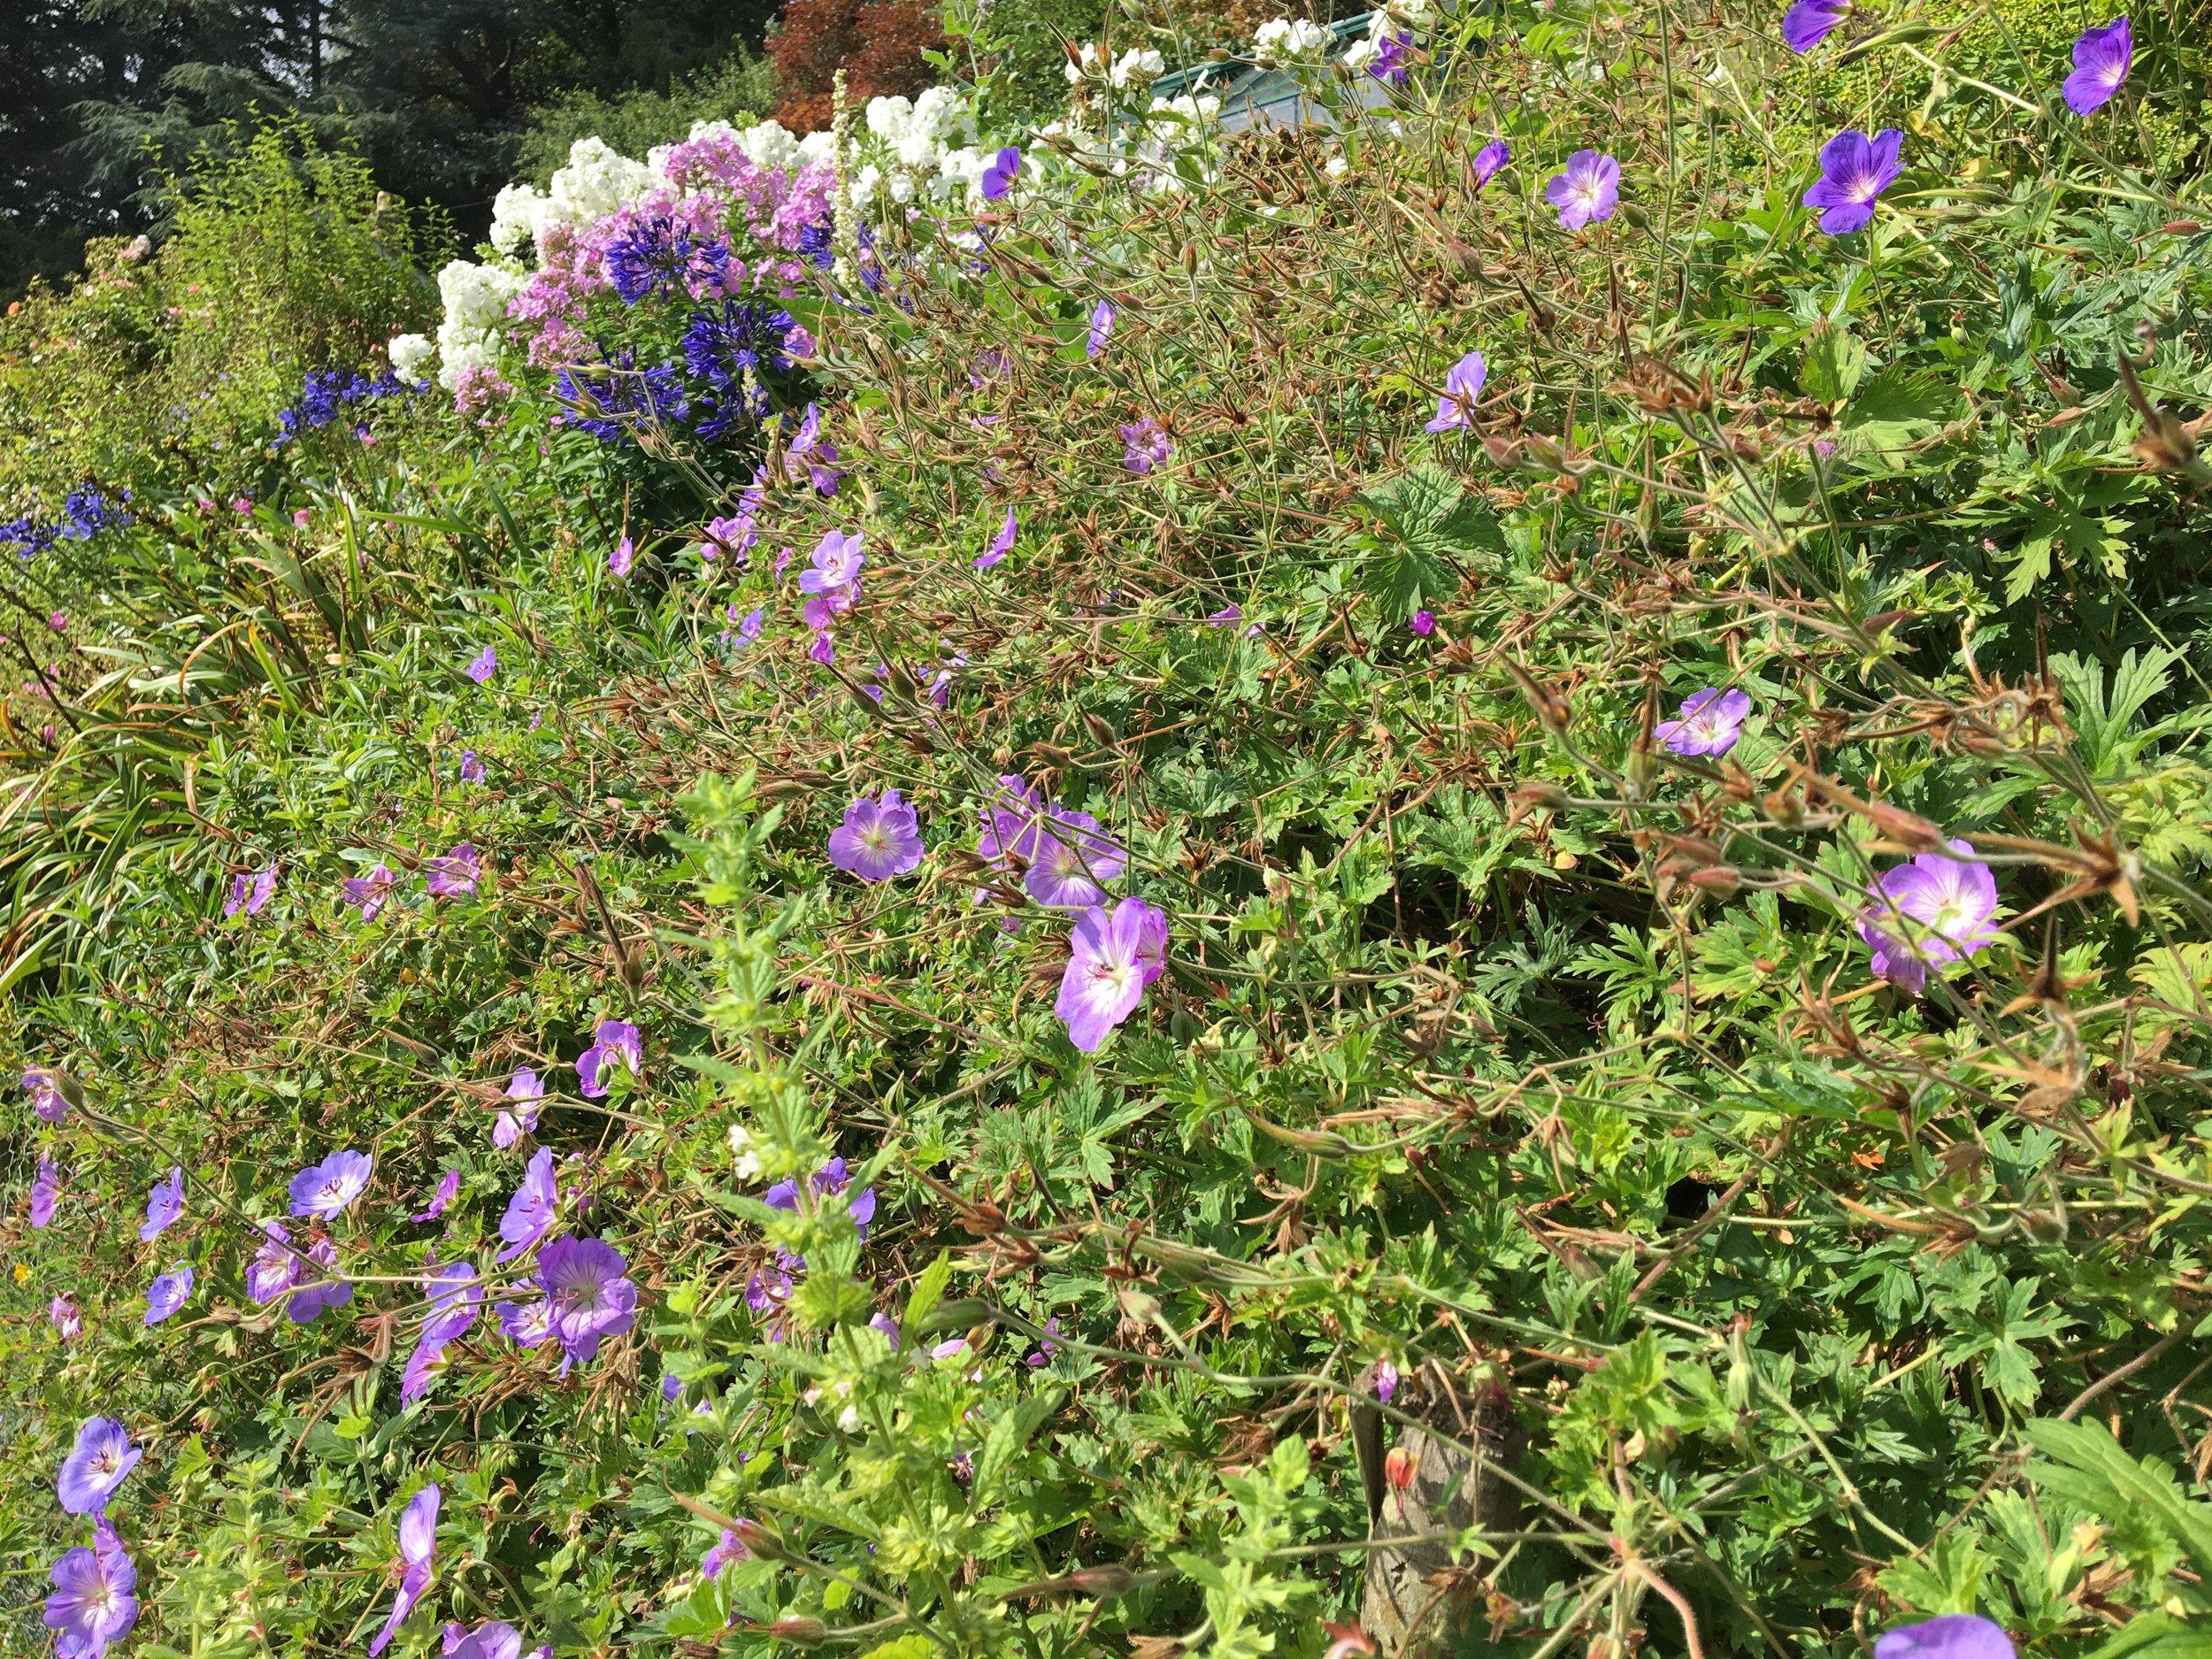 Phlox, agapanthus and geraniums